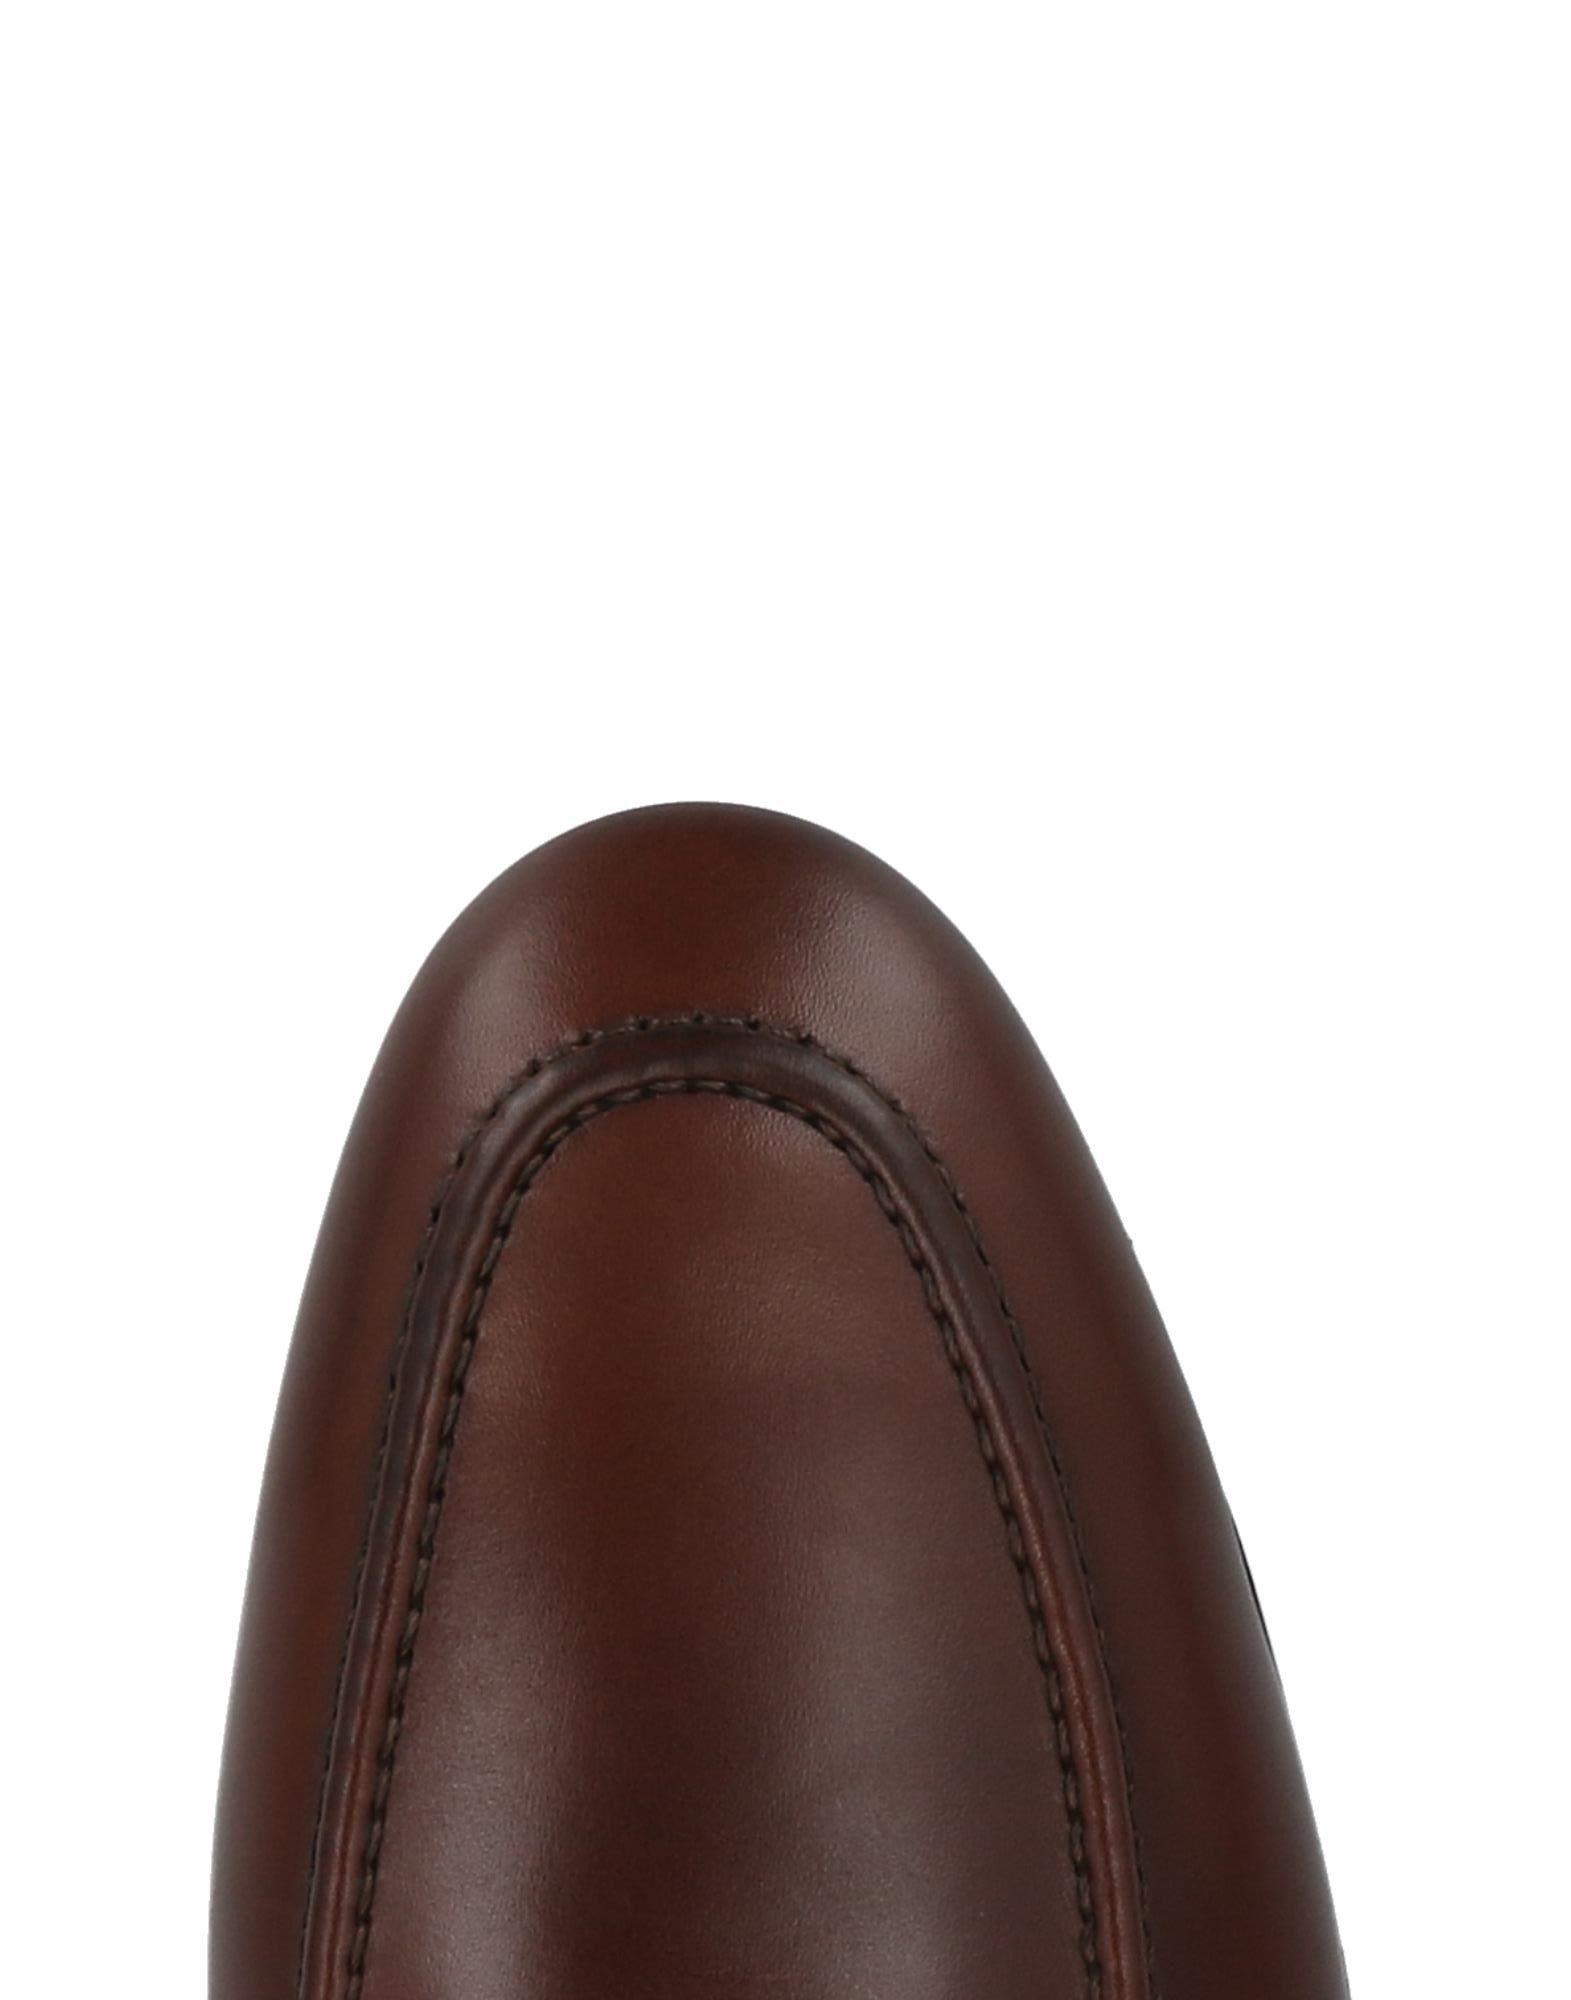 Dsquared2 Mokassins Herren  11441091LT Gute Qualität beliebte Schuhe